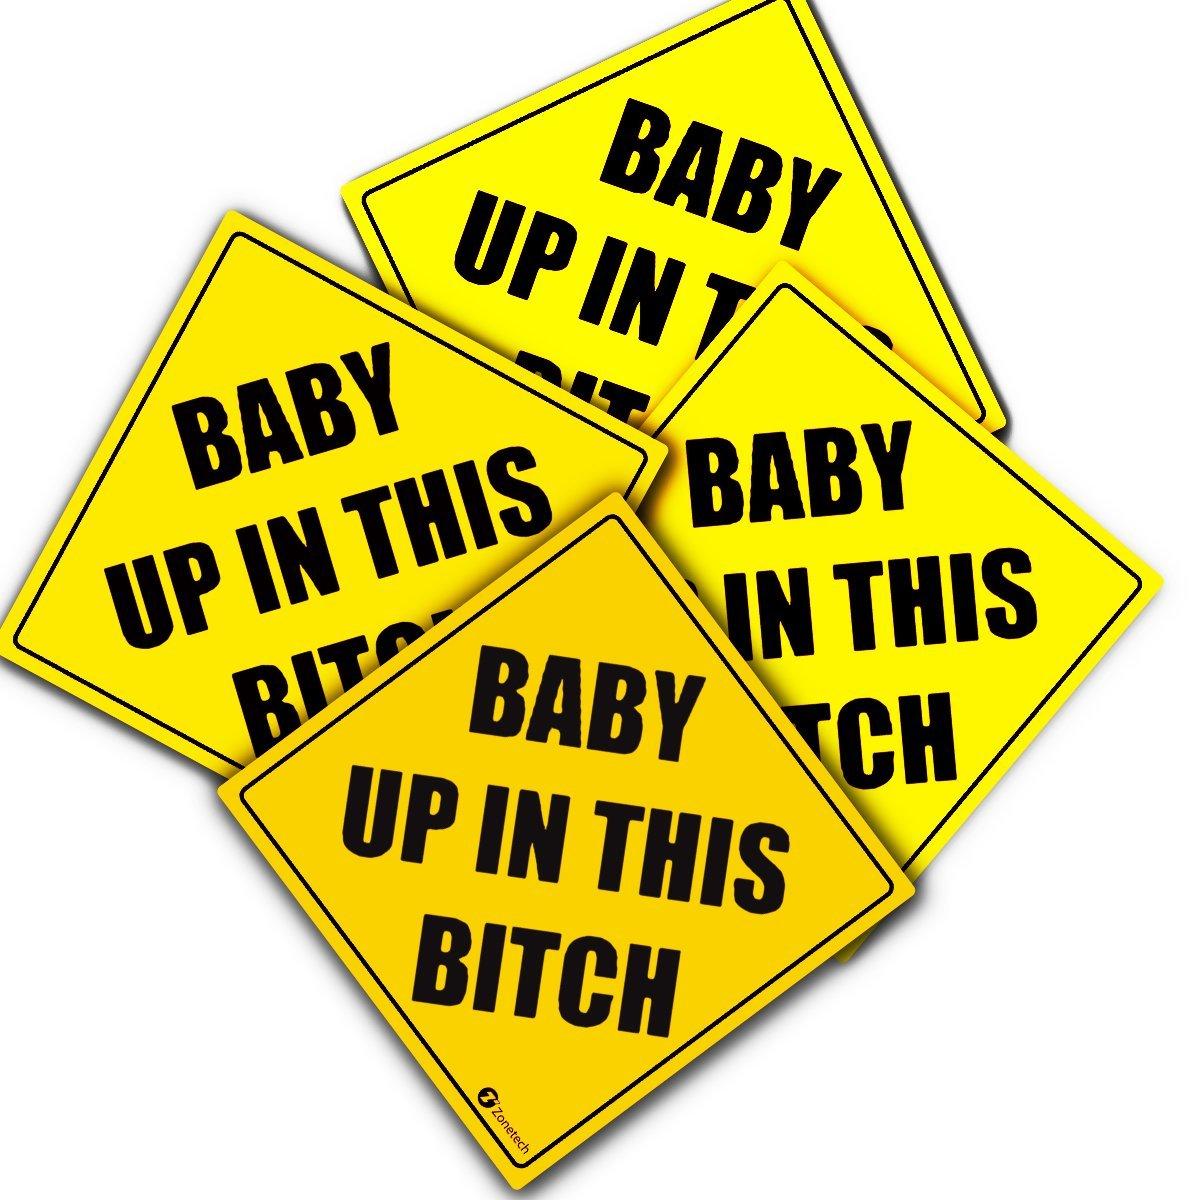 "Zone Tech ""Baby Up In This Bitch"" Vehicle Safety Sticker - 4-Pack Premium Quality Convenient Reflective ""Baby Up On This Bitch"" Vehicle Safety Funny Sign Sticker"